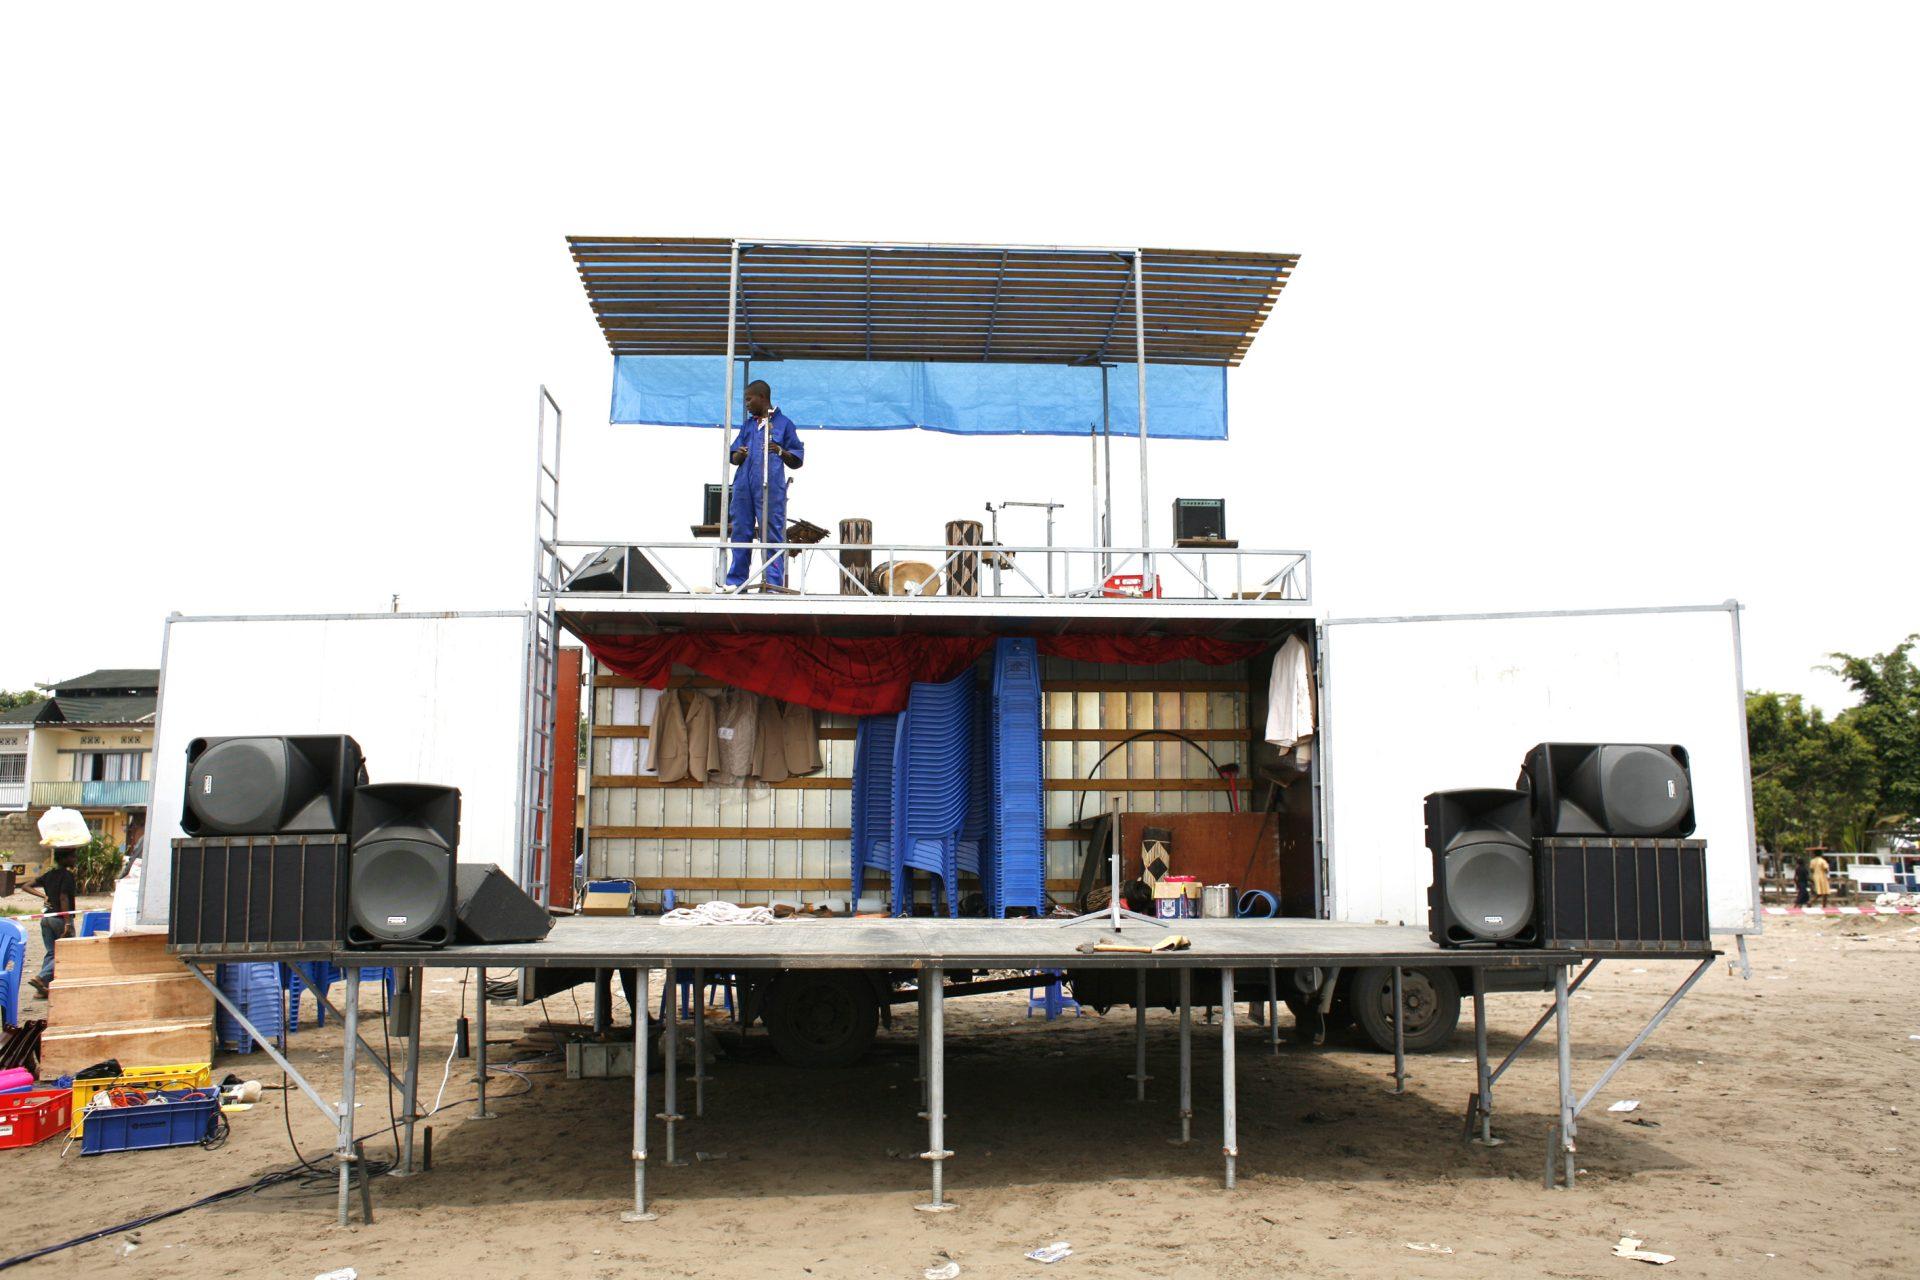 Opbouw vrachtwagen Basal'ya Bazoba Congo Kinshasa 2009